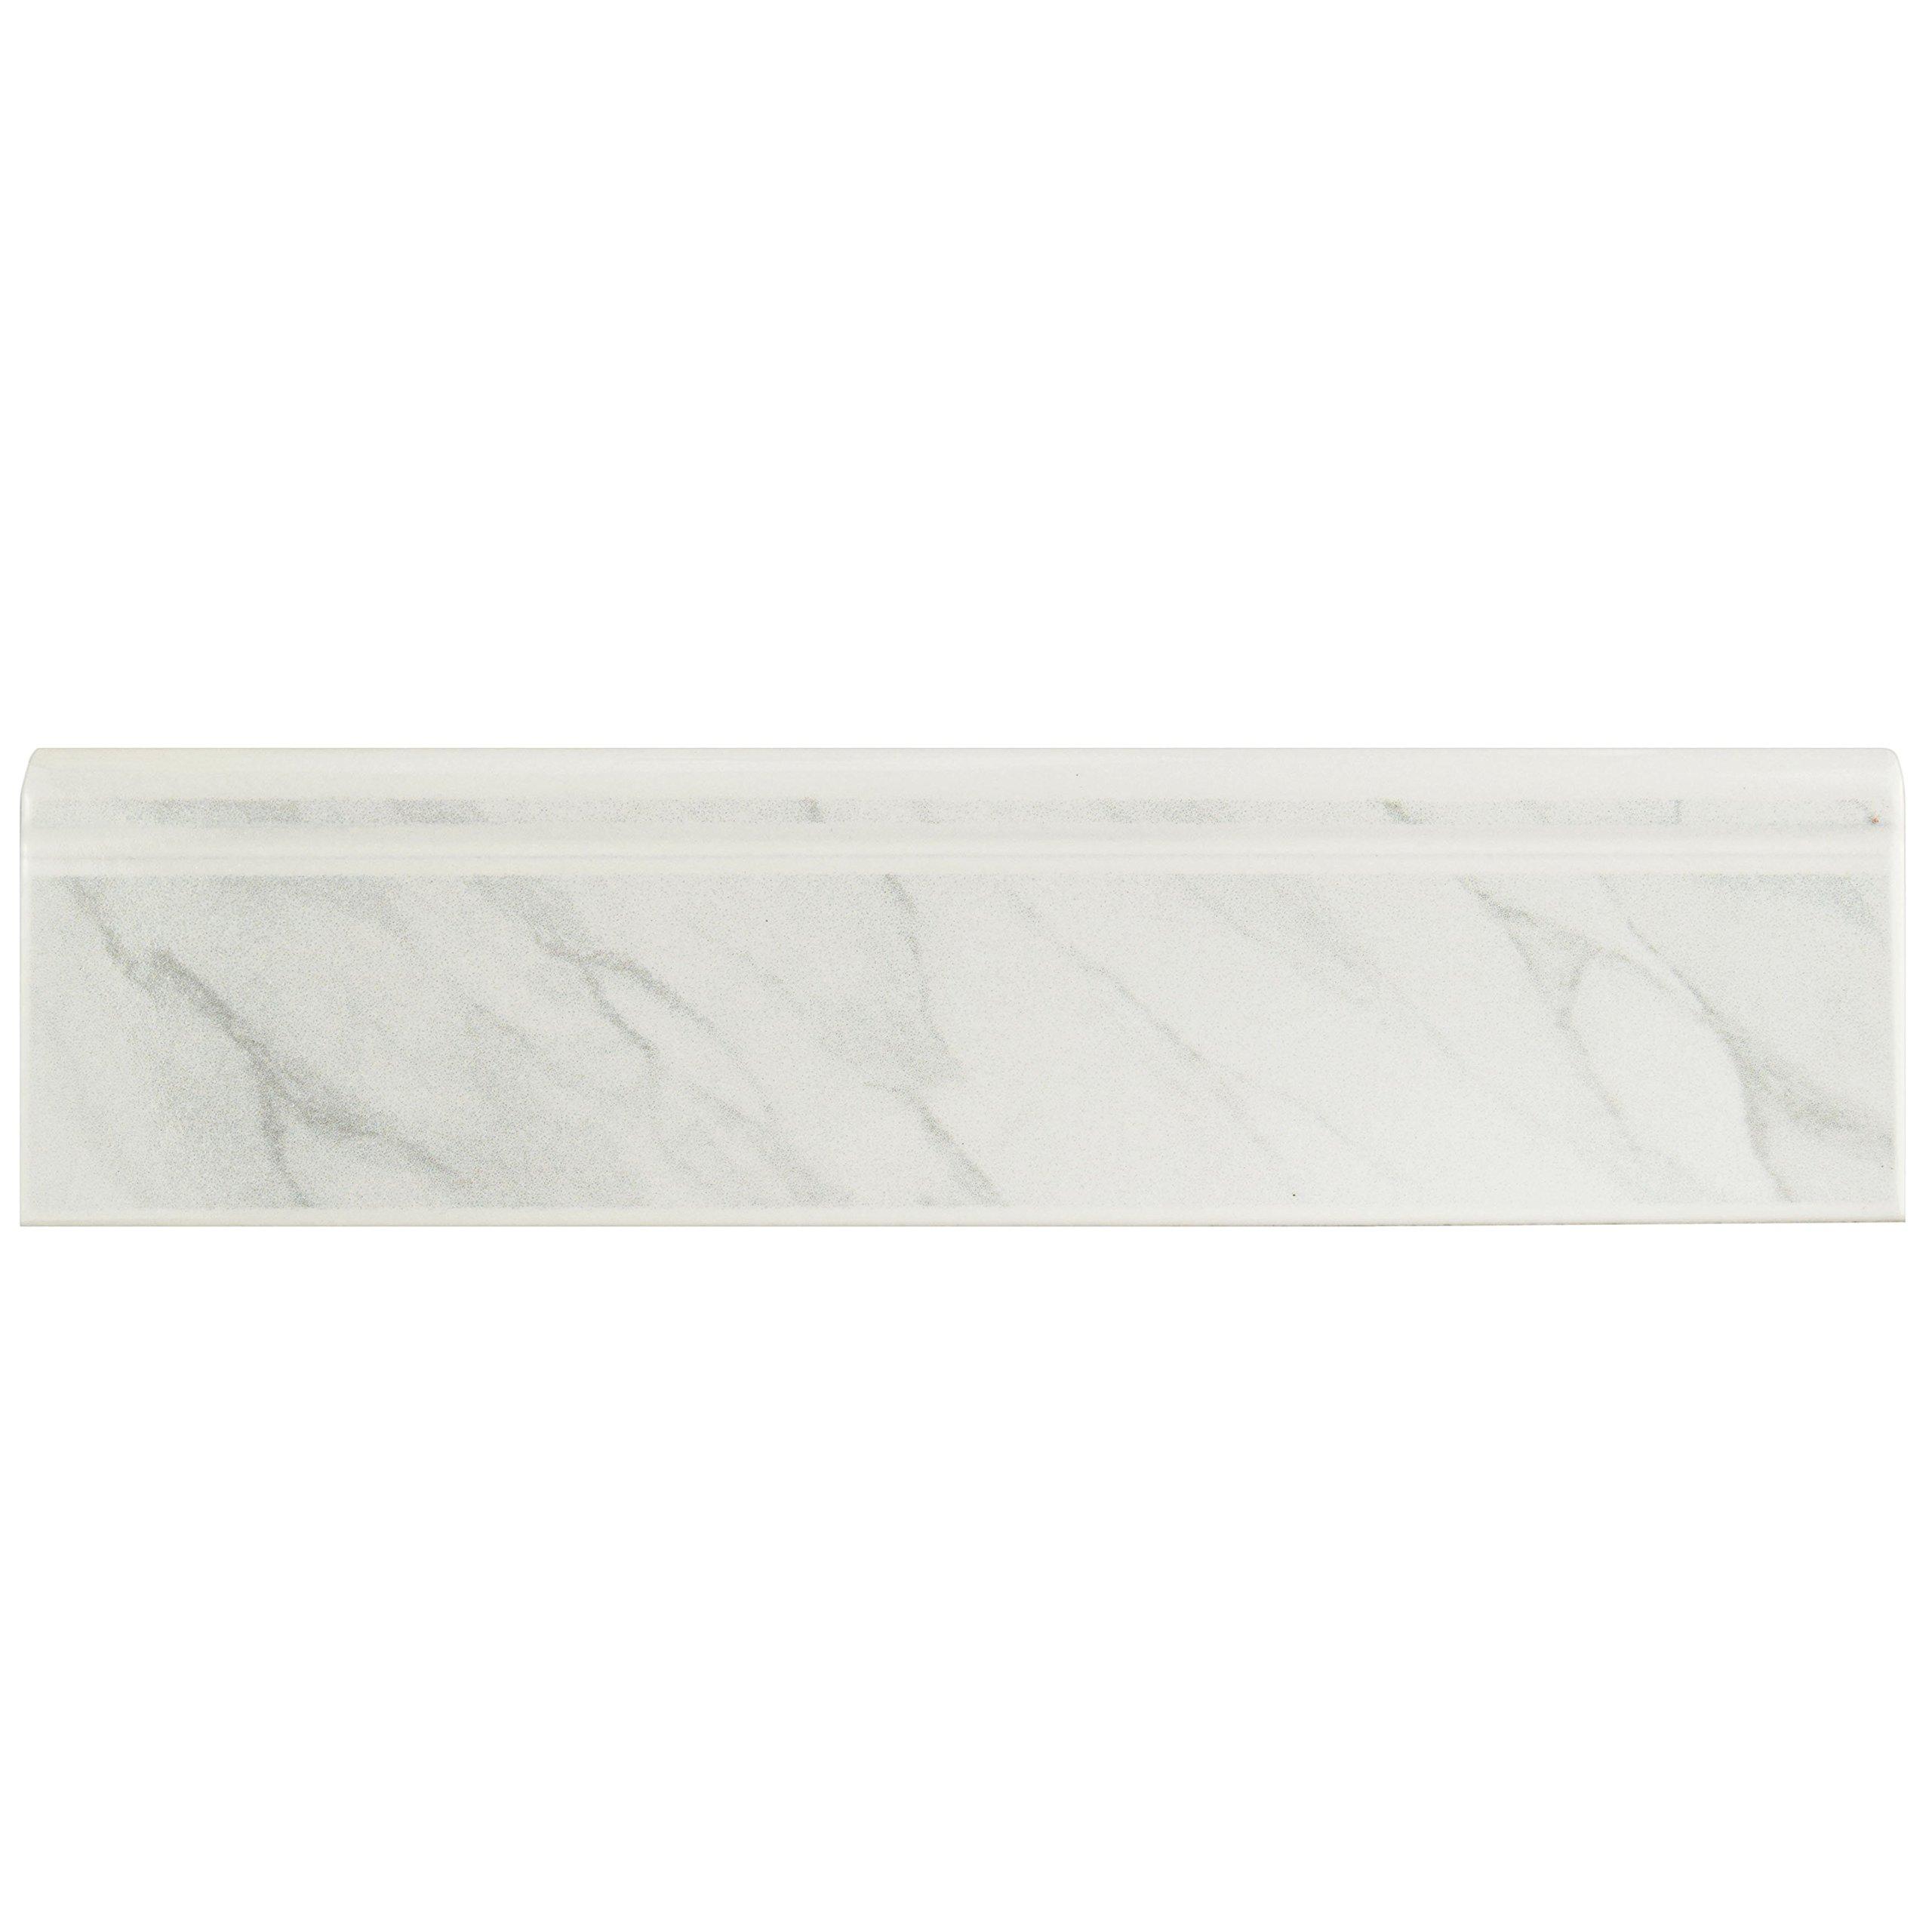 SomerTile WOSBTMWM Quadra Satin Marble Ceramic Base Trim Molding, 3.25'' x 12.375'', white/grey